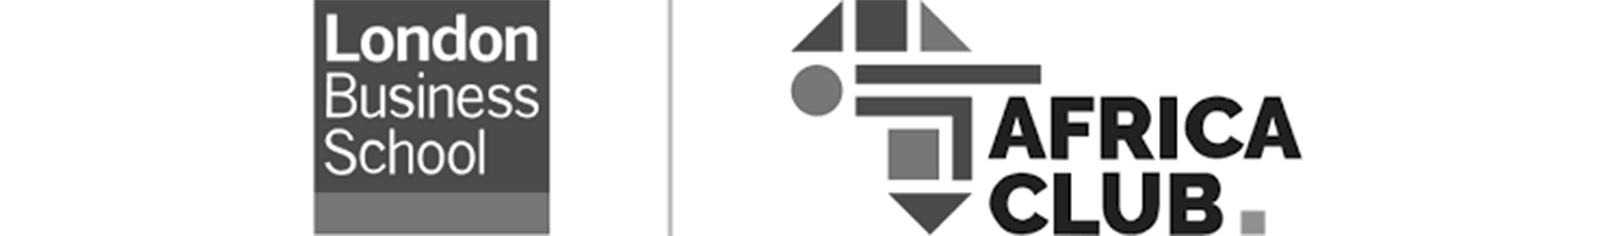 LBS_logo-grey